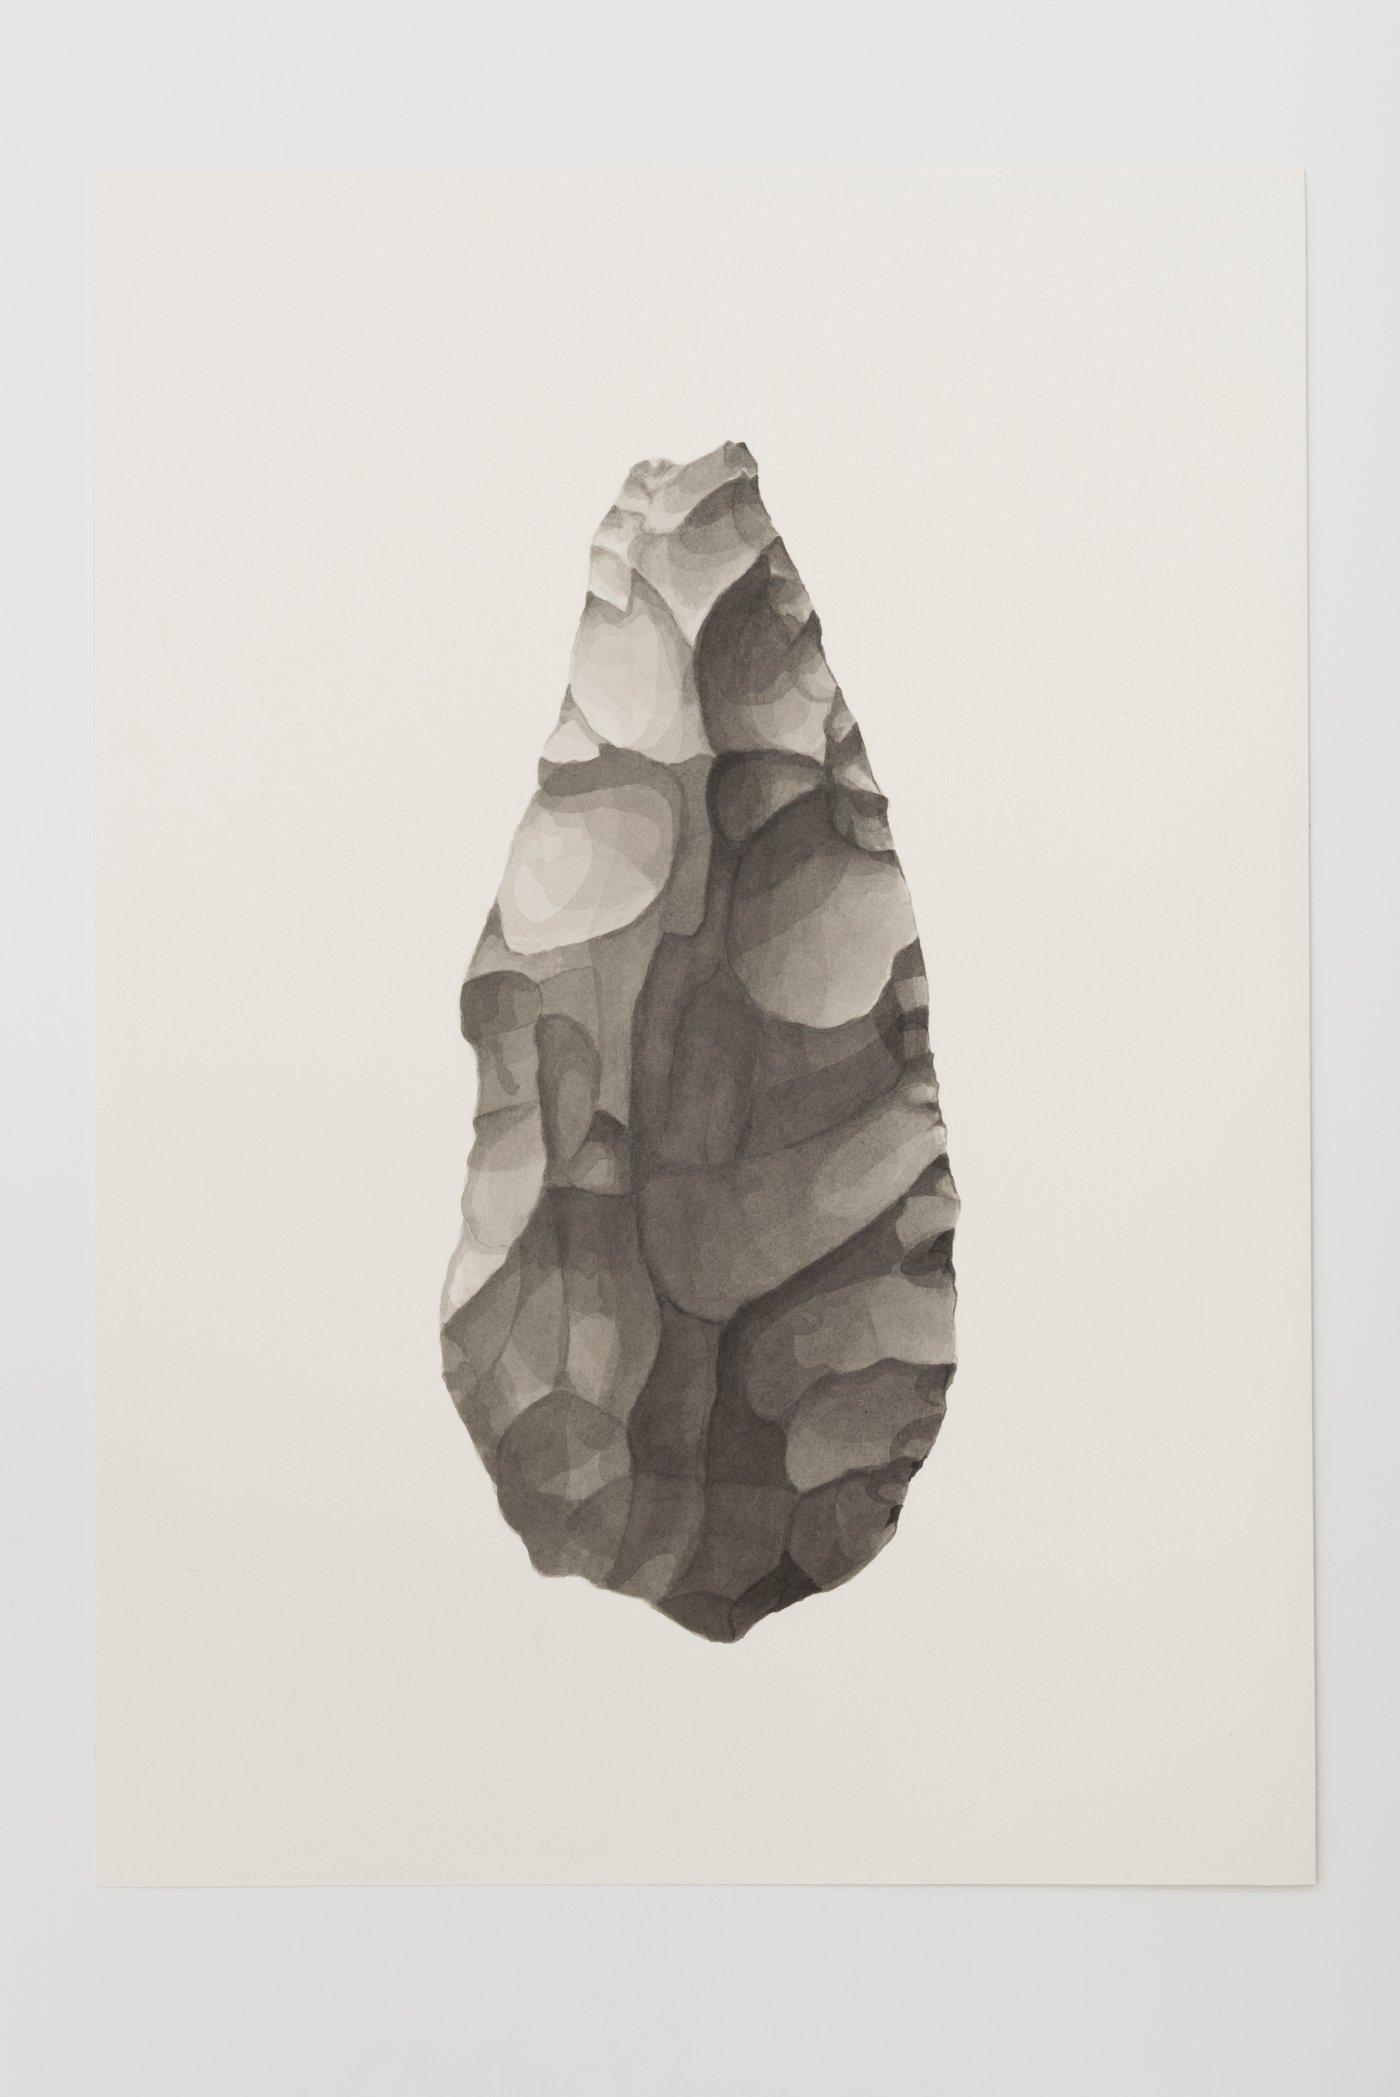 Ungrounded object 1 (Olduvai Axe III)